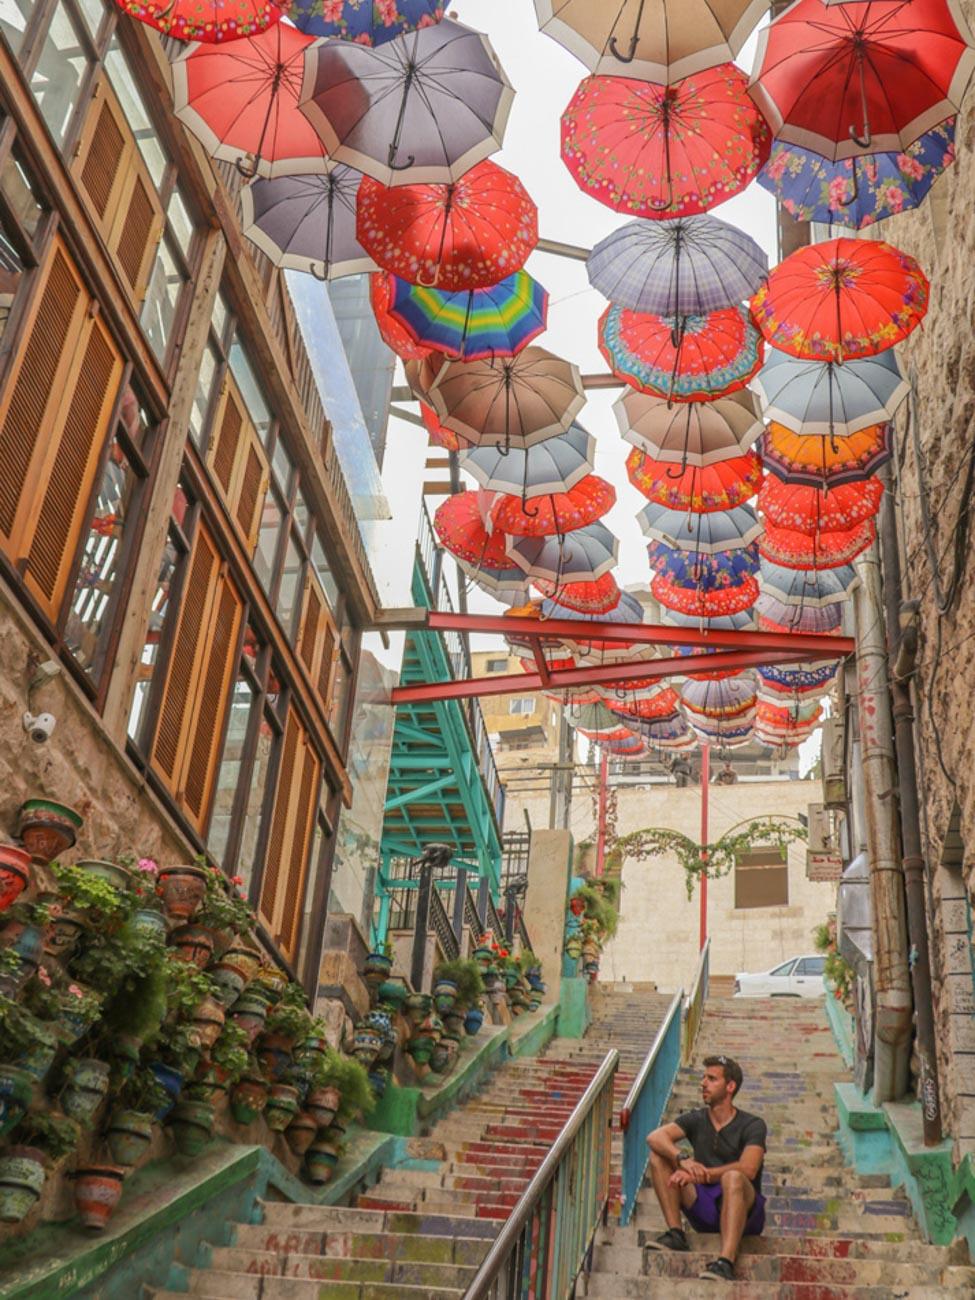 Umbrella in Amman - Jordan